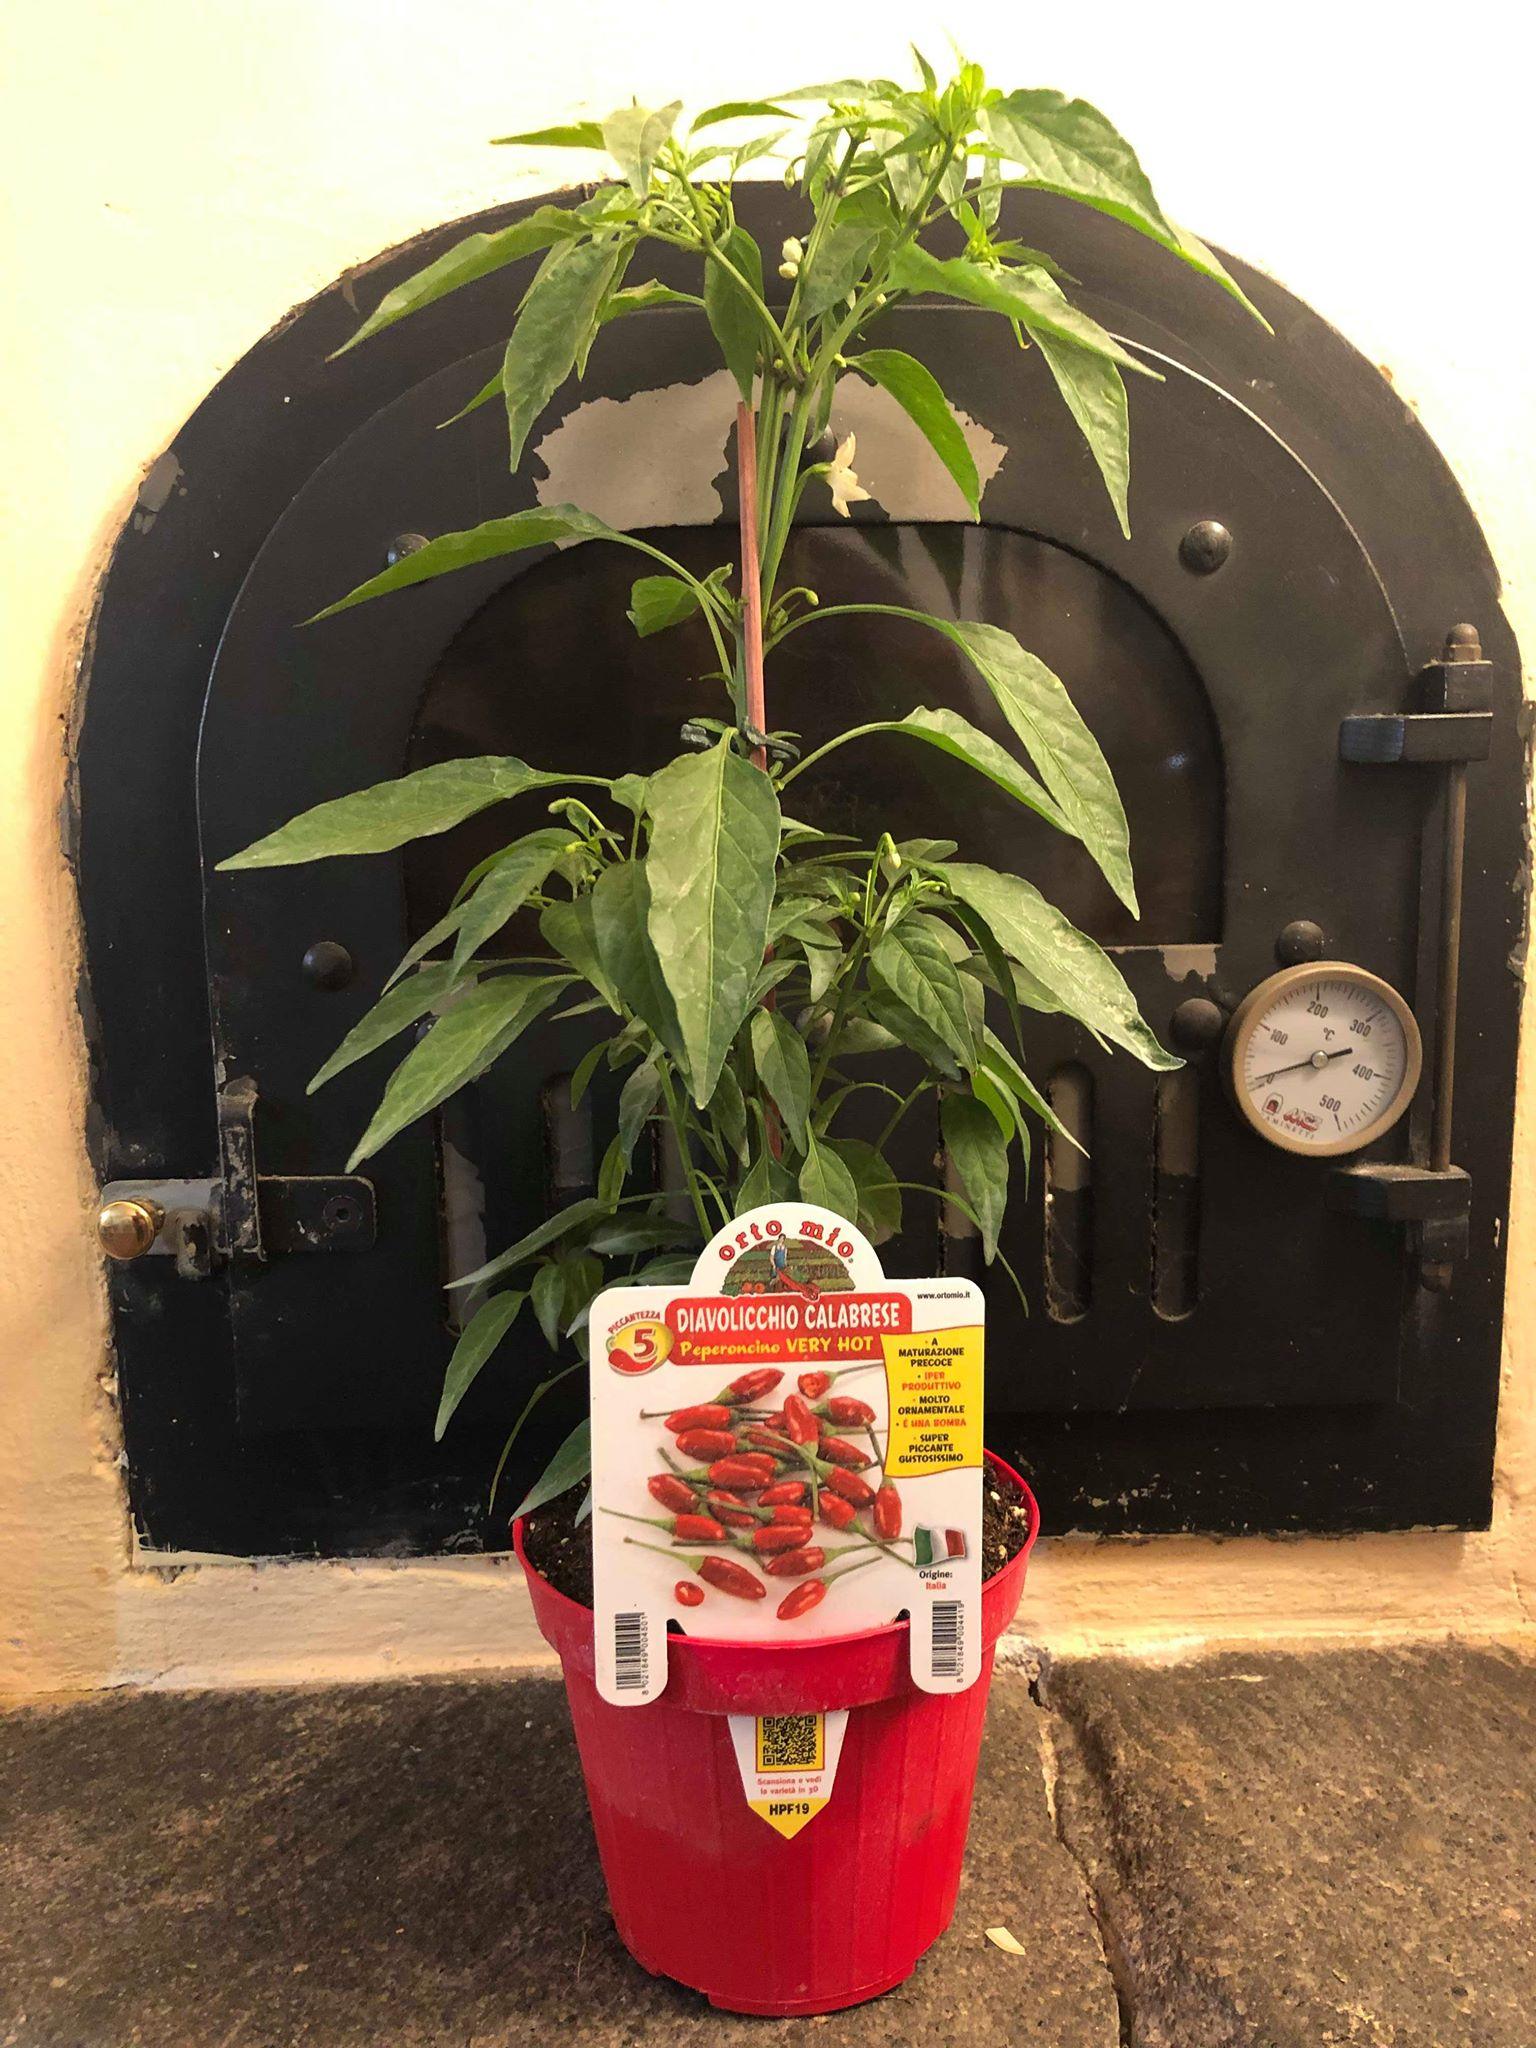 Hot Pepper Calabrese diavolicchio Italico Pot Plant - Orto mio